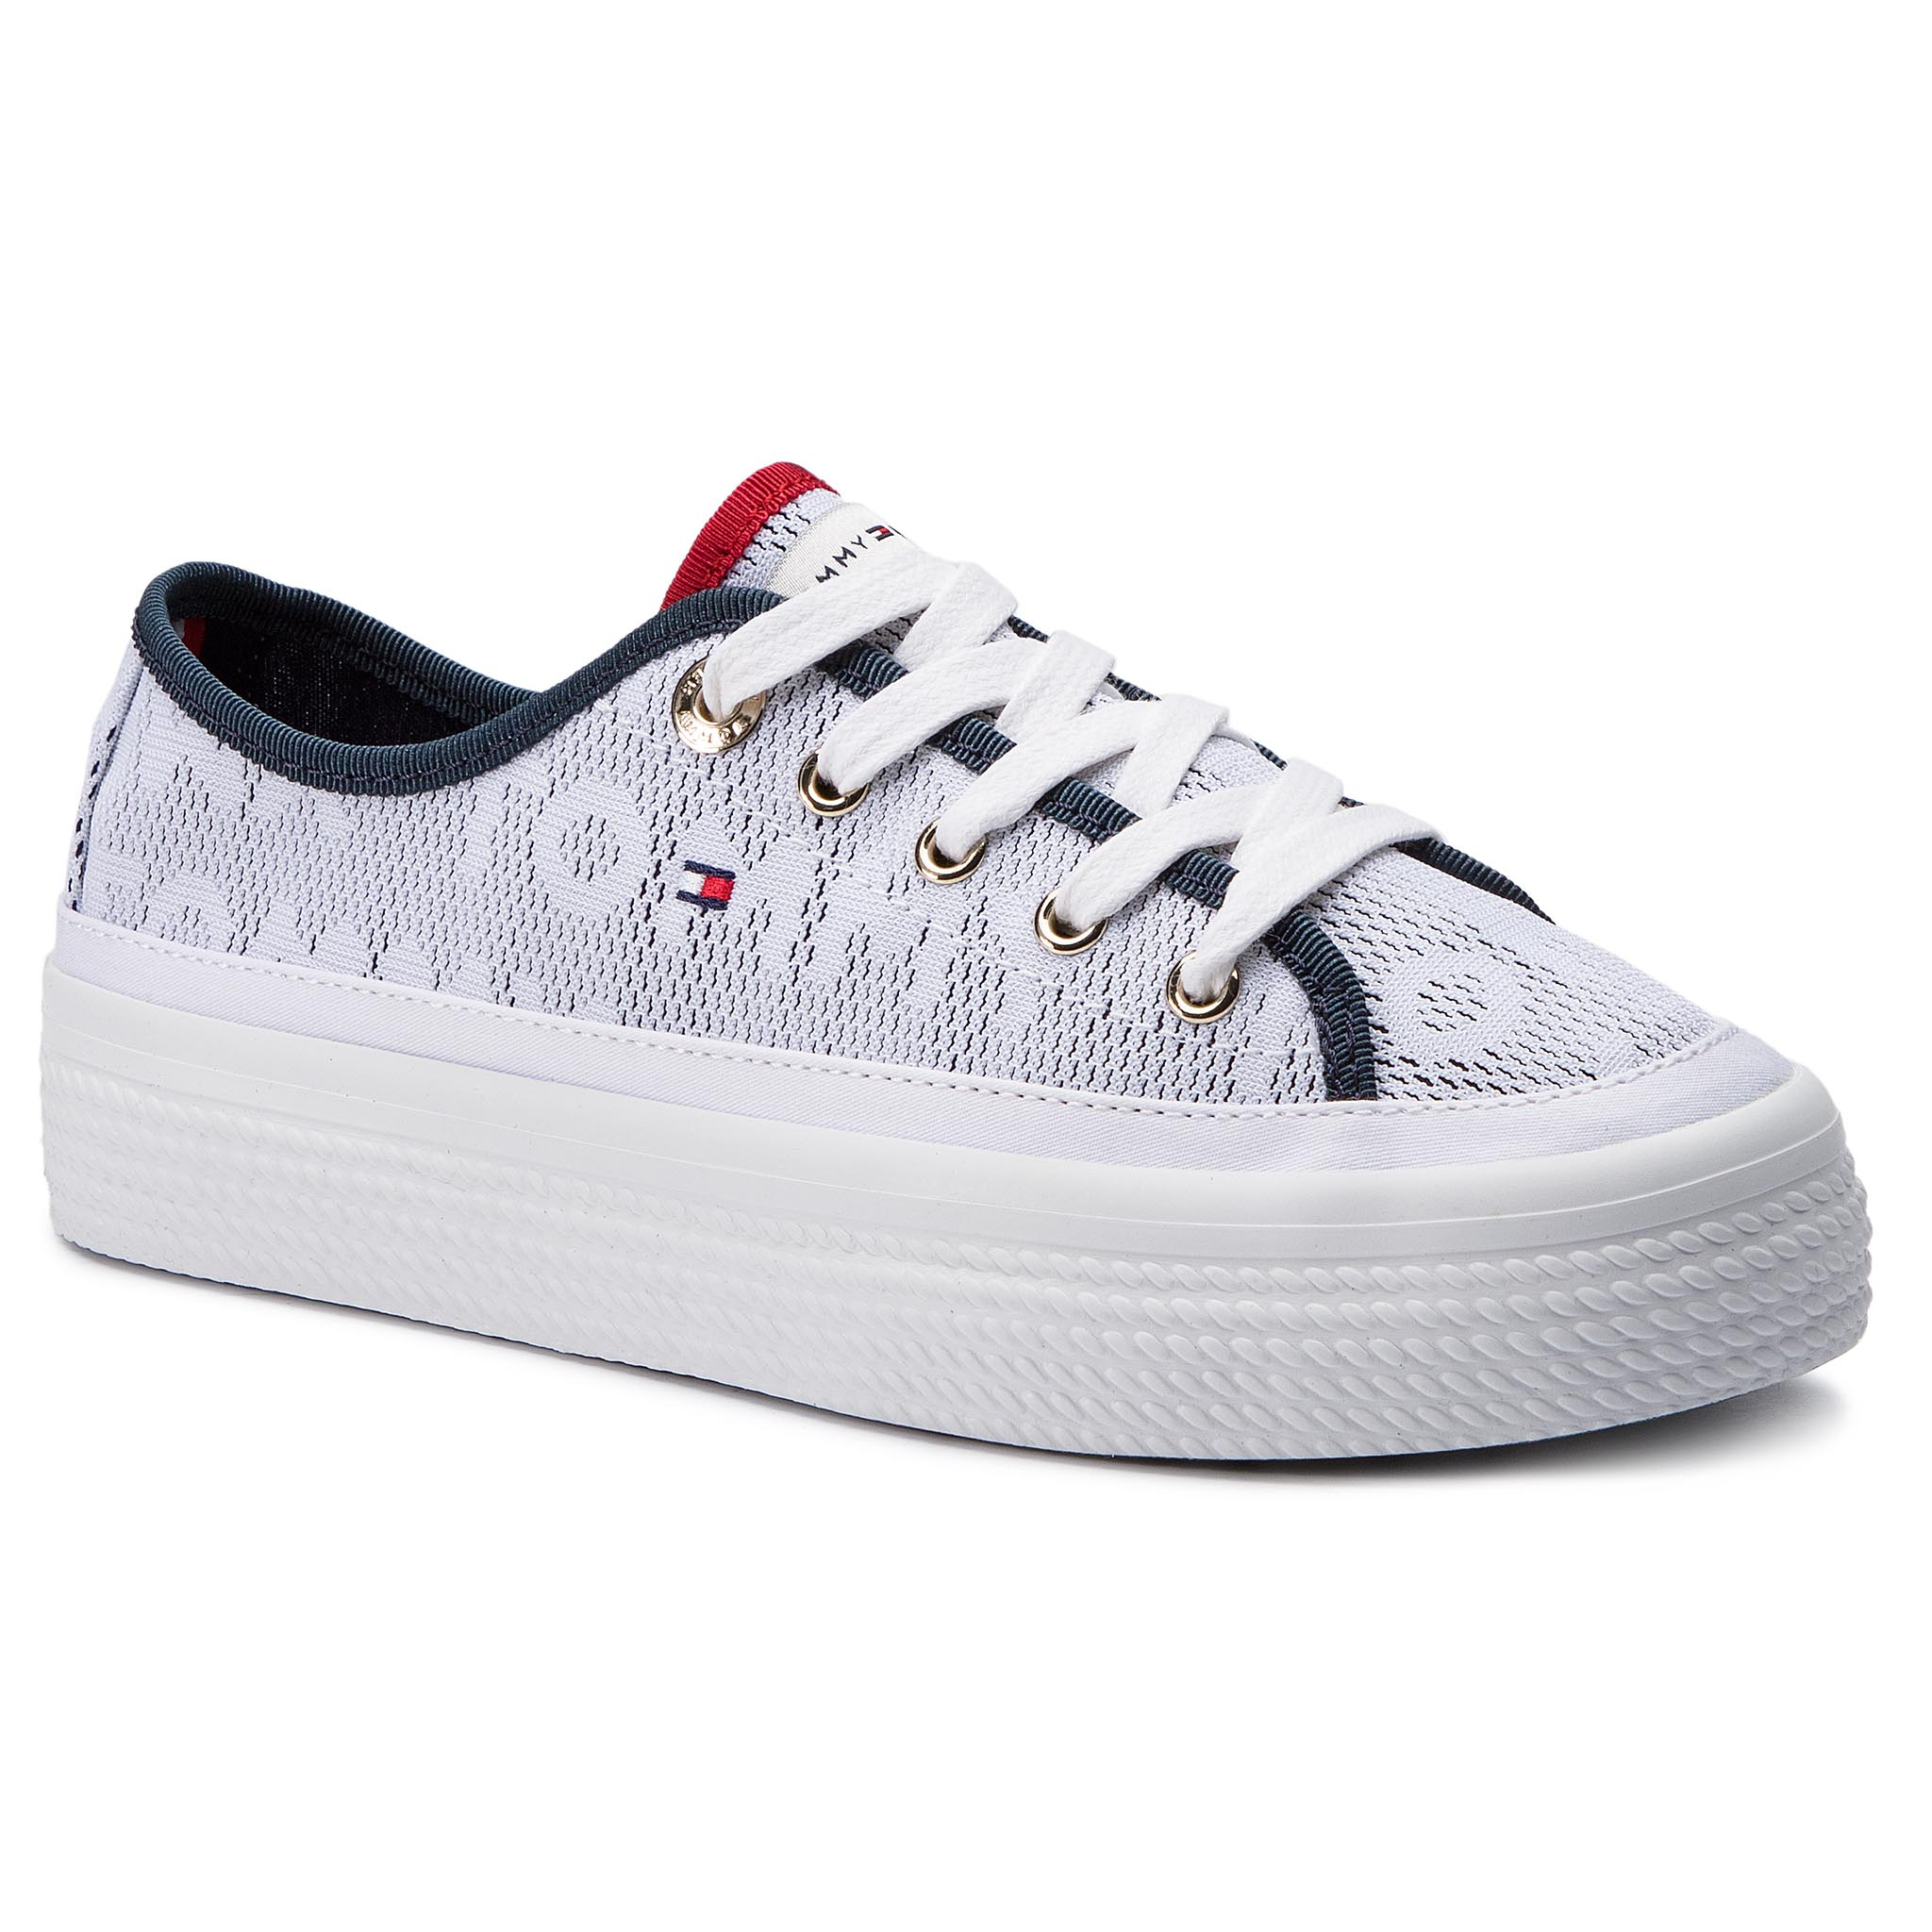 9f6c7cae8799b Plimsolls TOMMY HILFIGER Jacquard Flatform Sneaker FW0FW04071 White 100